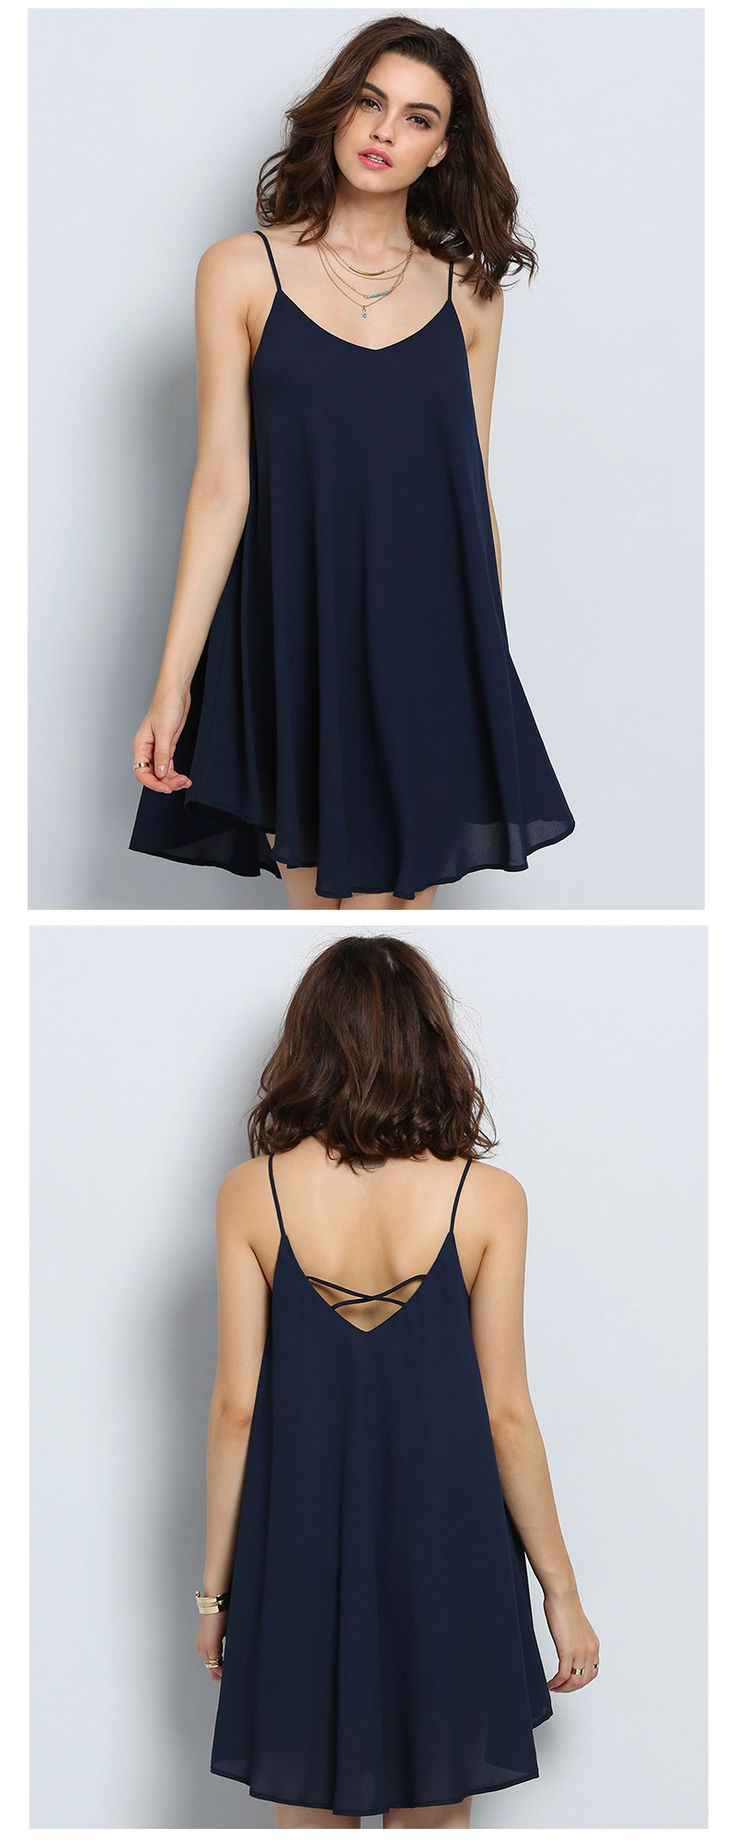 Best 25+ Cute dresses ideas on Pinterest